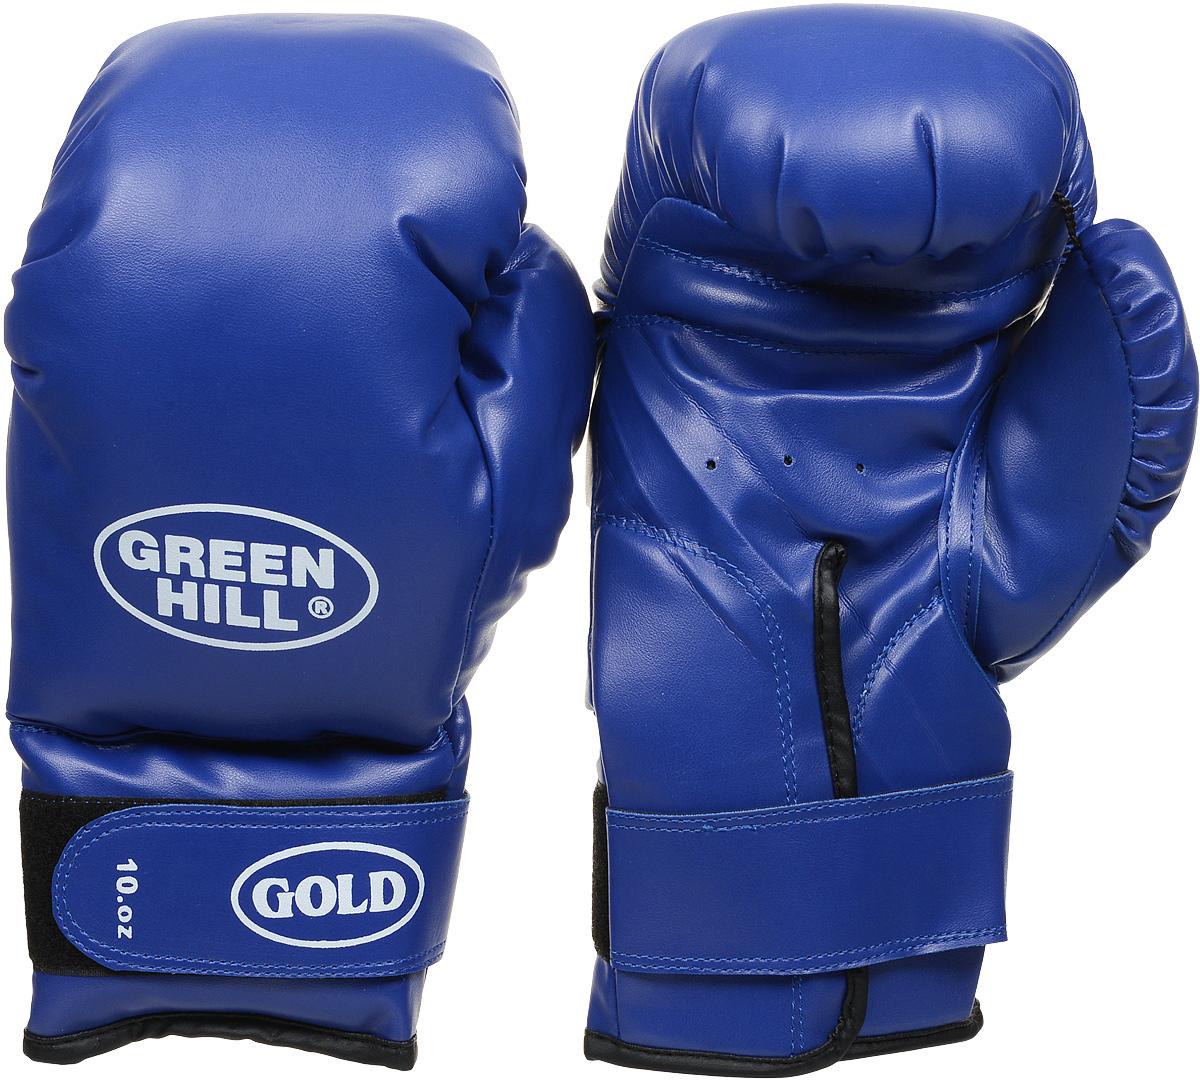 Перчатки боксерские Green Hill Gold, цвет: синий. Вес 10 унций